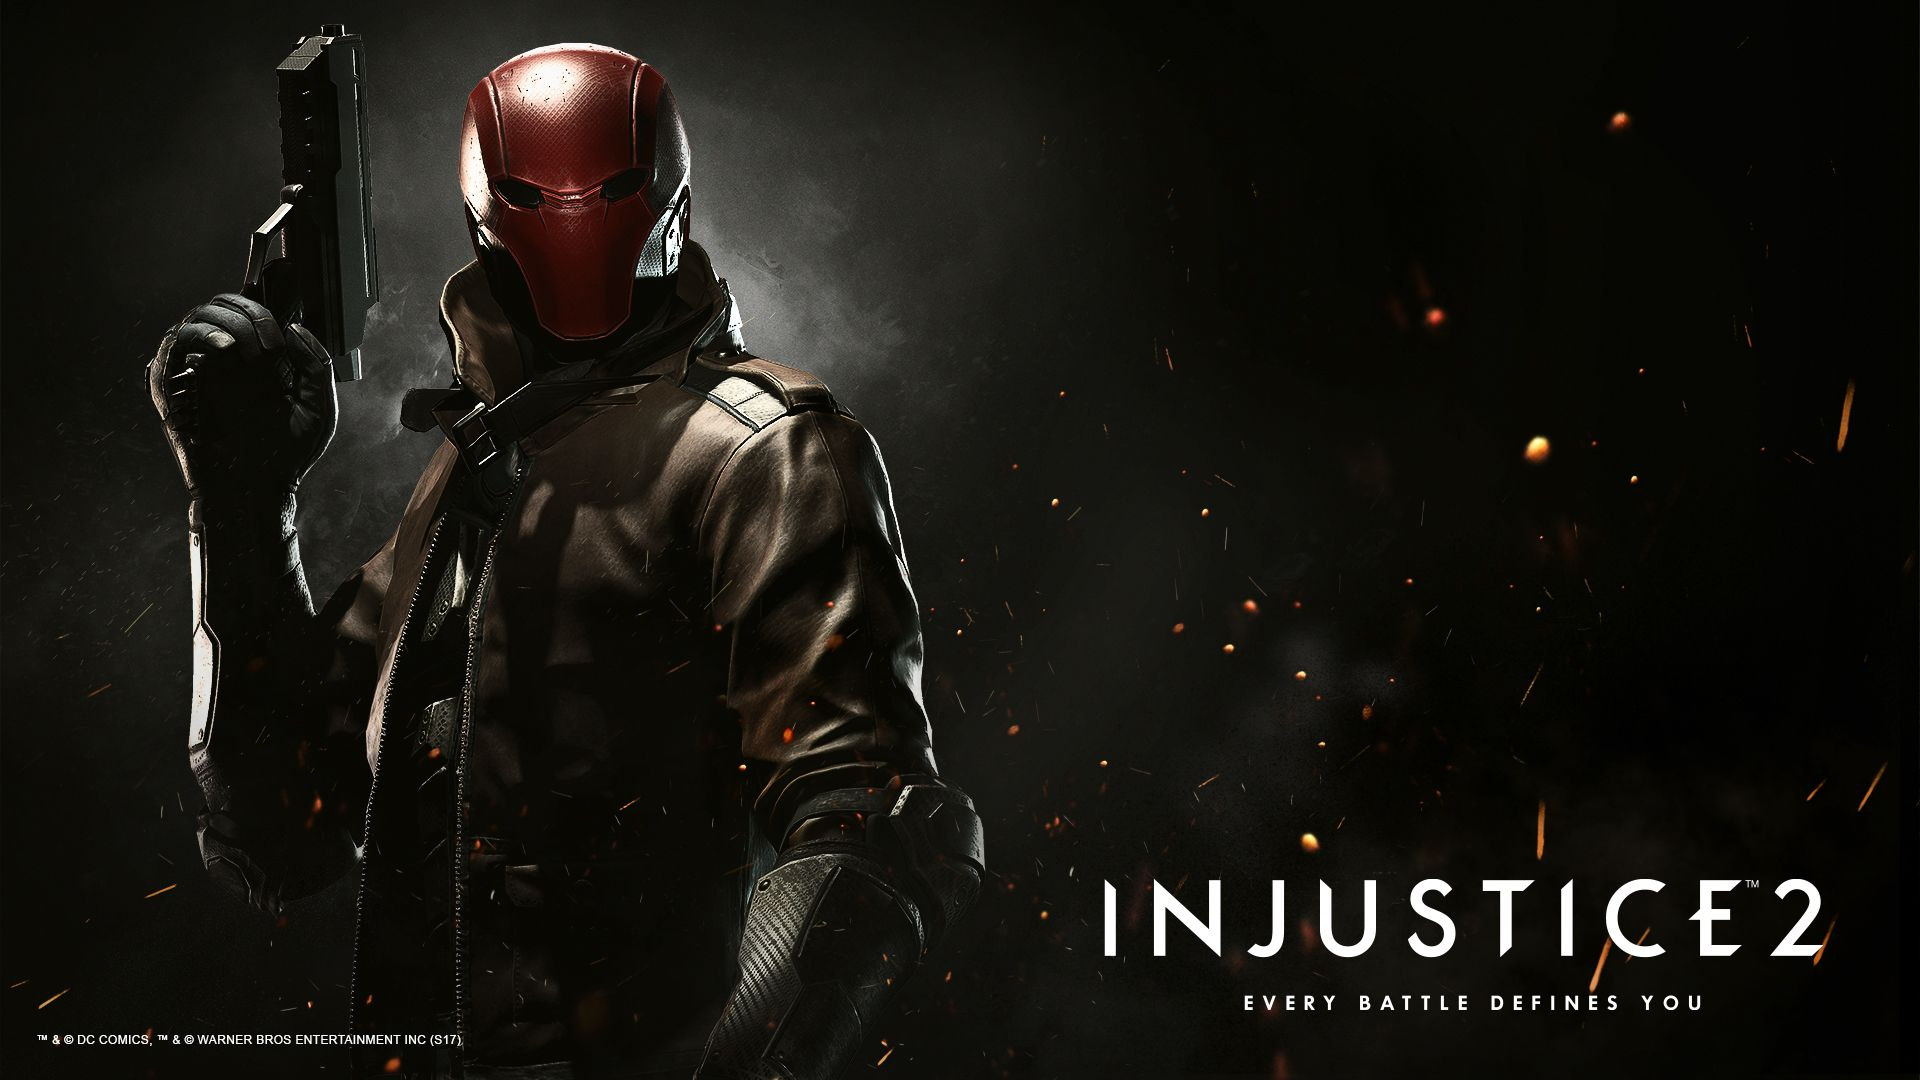 Red Hood Injustice 2 - HD Wallpaper